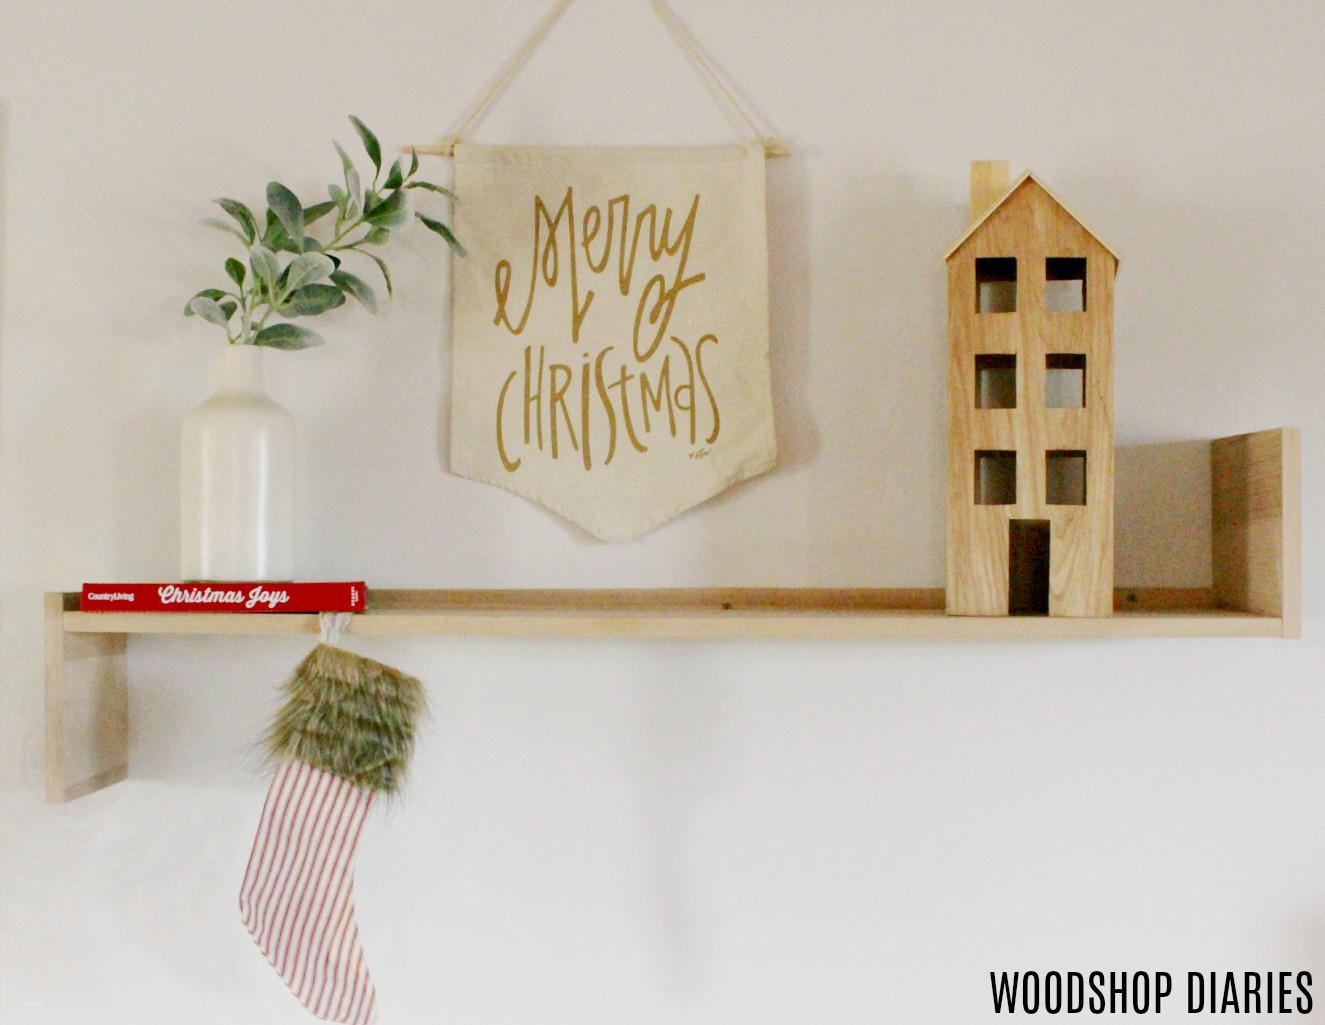 How to Build a Modern, Minimalist Wooden Shelf